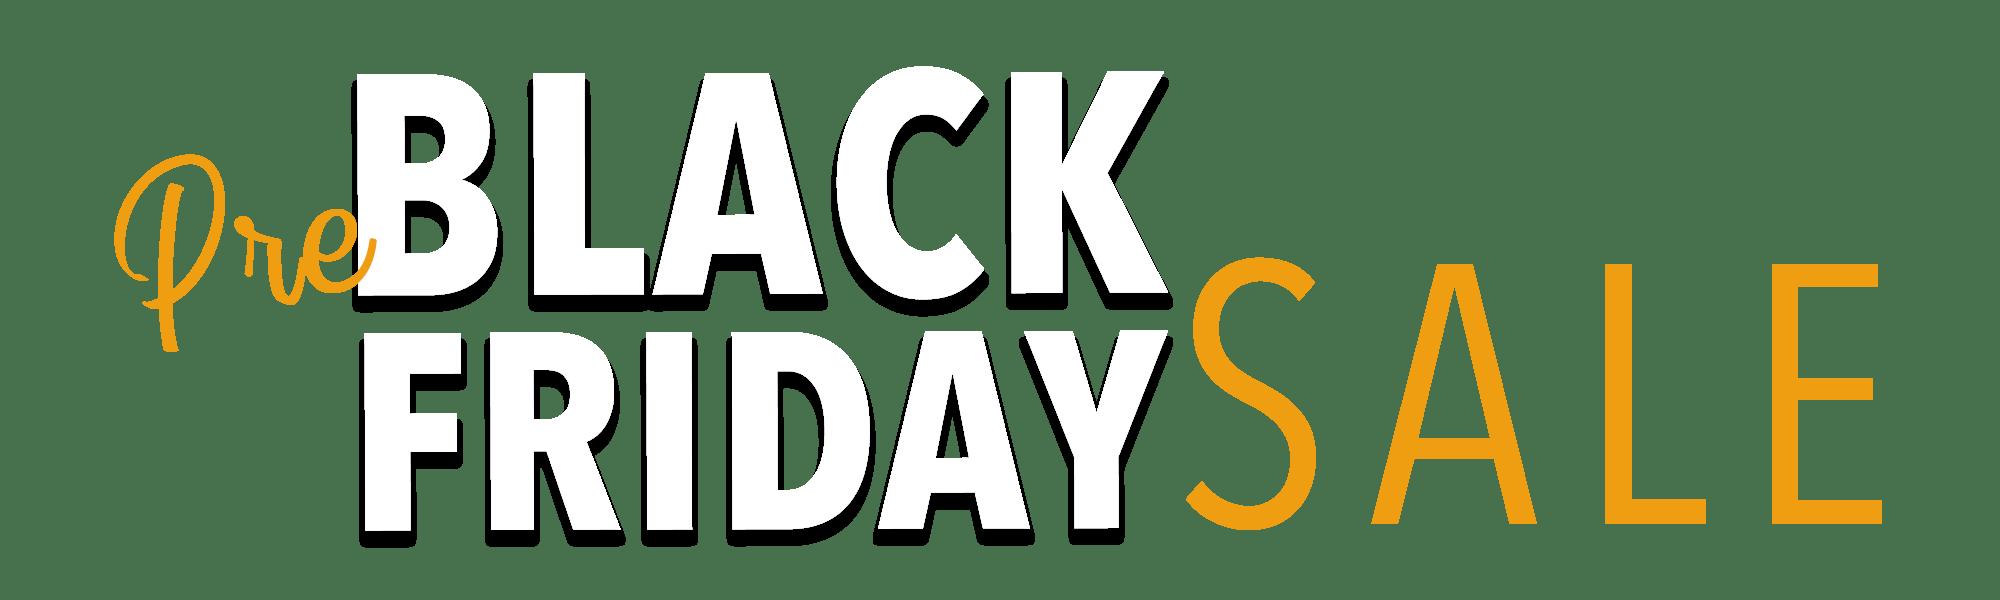 Pre Black Friday Sale Heading